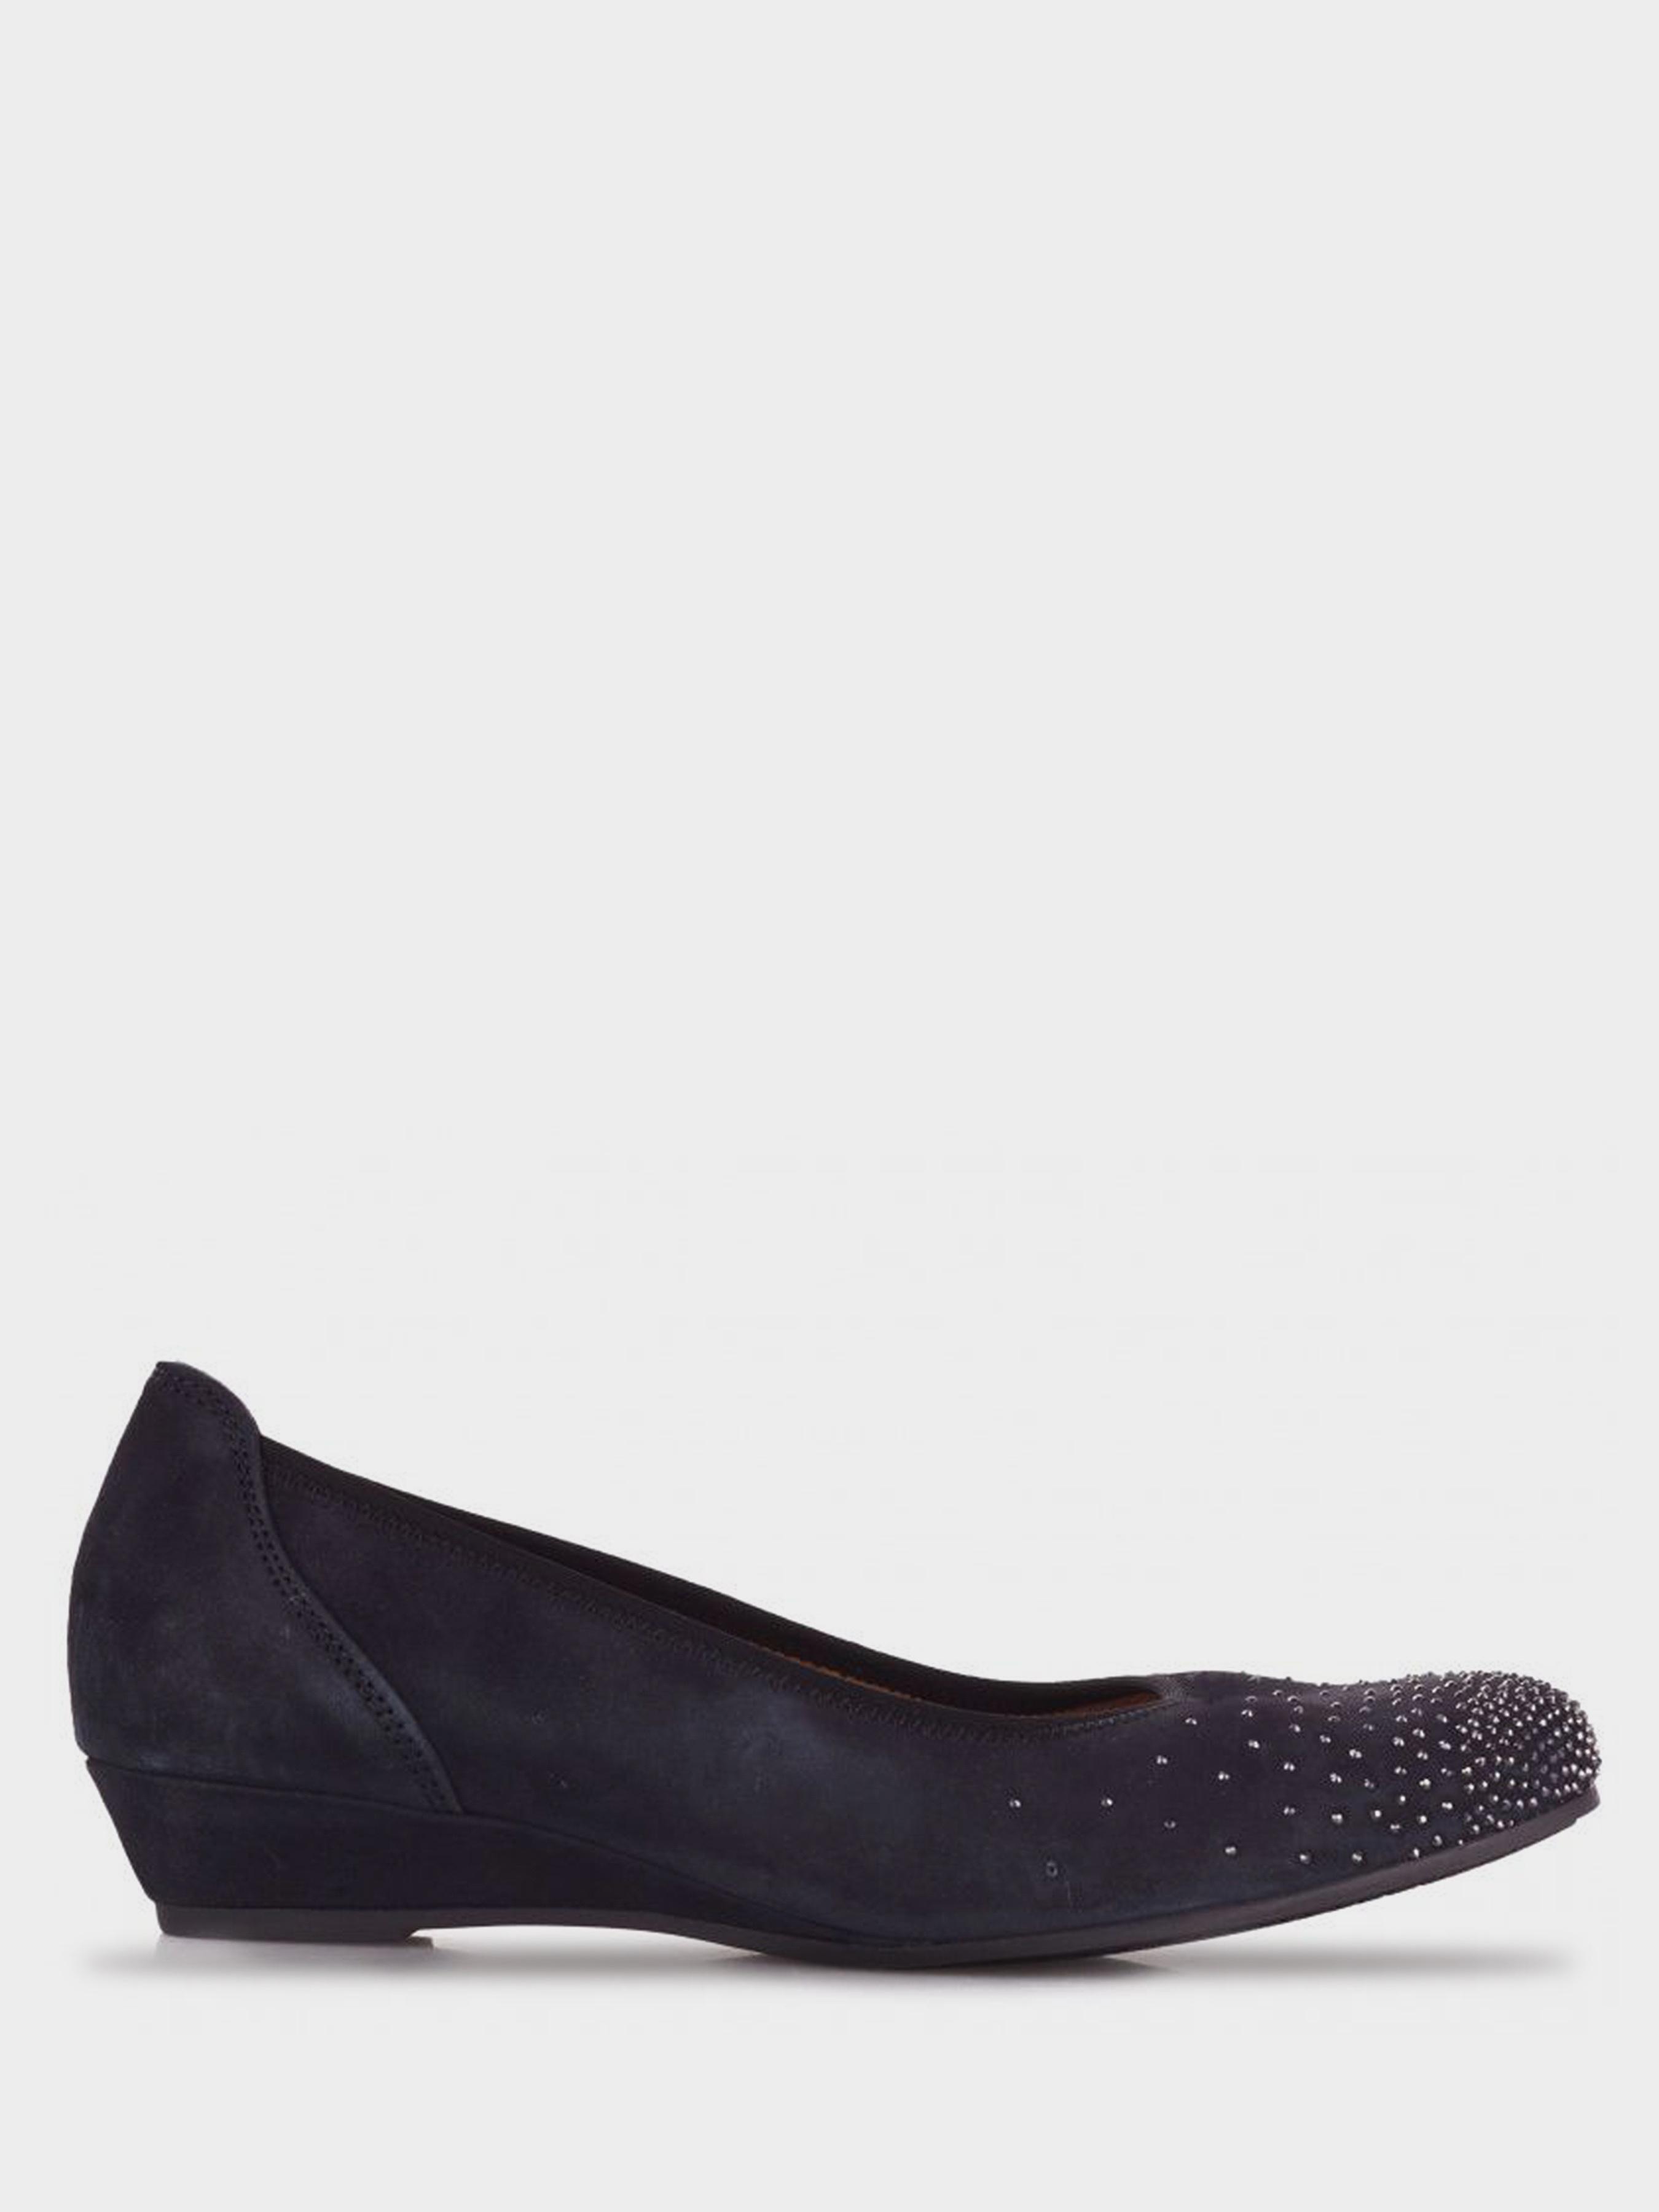 Туфли женские Gabor GB2233 , 2017